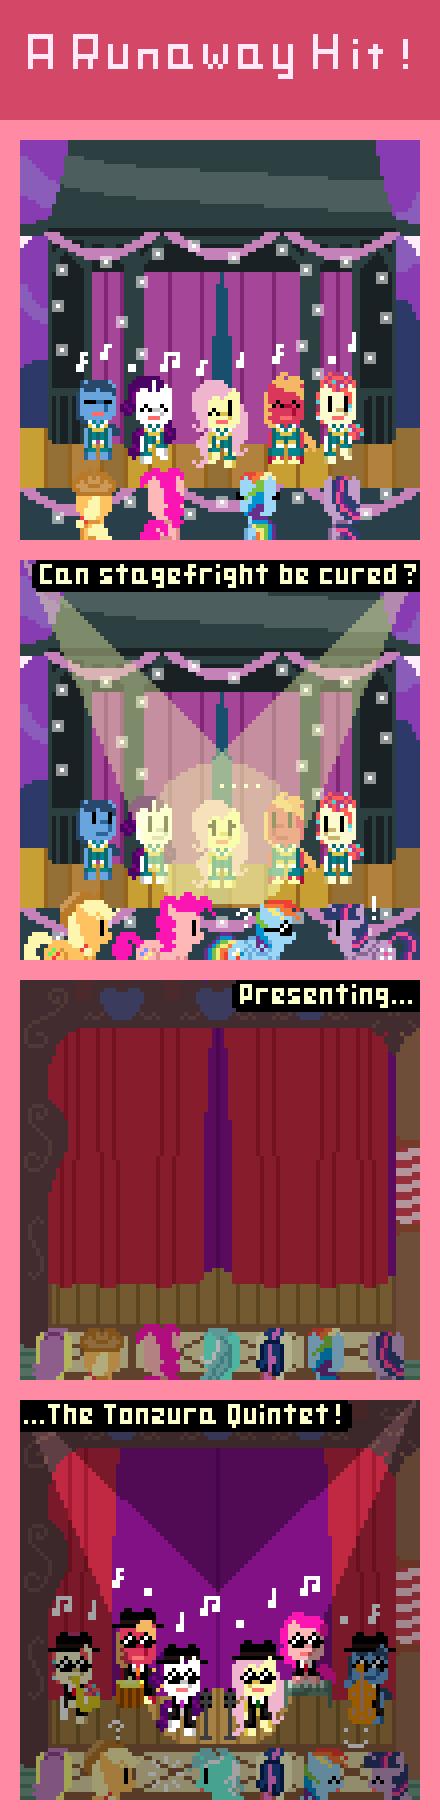 A Runaway Hit!. via: zztfox.deviantart.com/art/A-Runaway-Hit-434710651?ga_submit_new=10%253A1392614194&ga_type=edit&ga_changes=1&ga_recent=1 Rarity & Flutte retro pony pixel earthbound My Little Pony comic